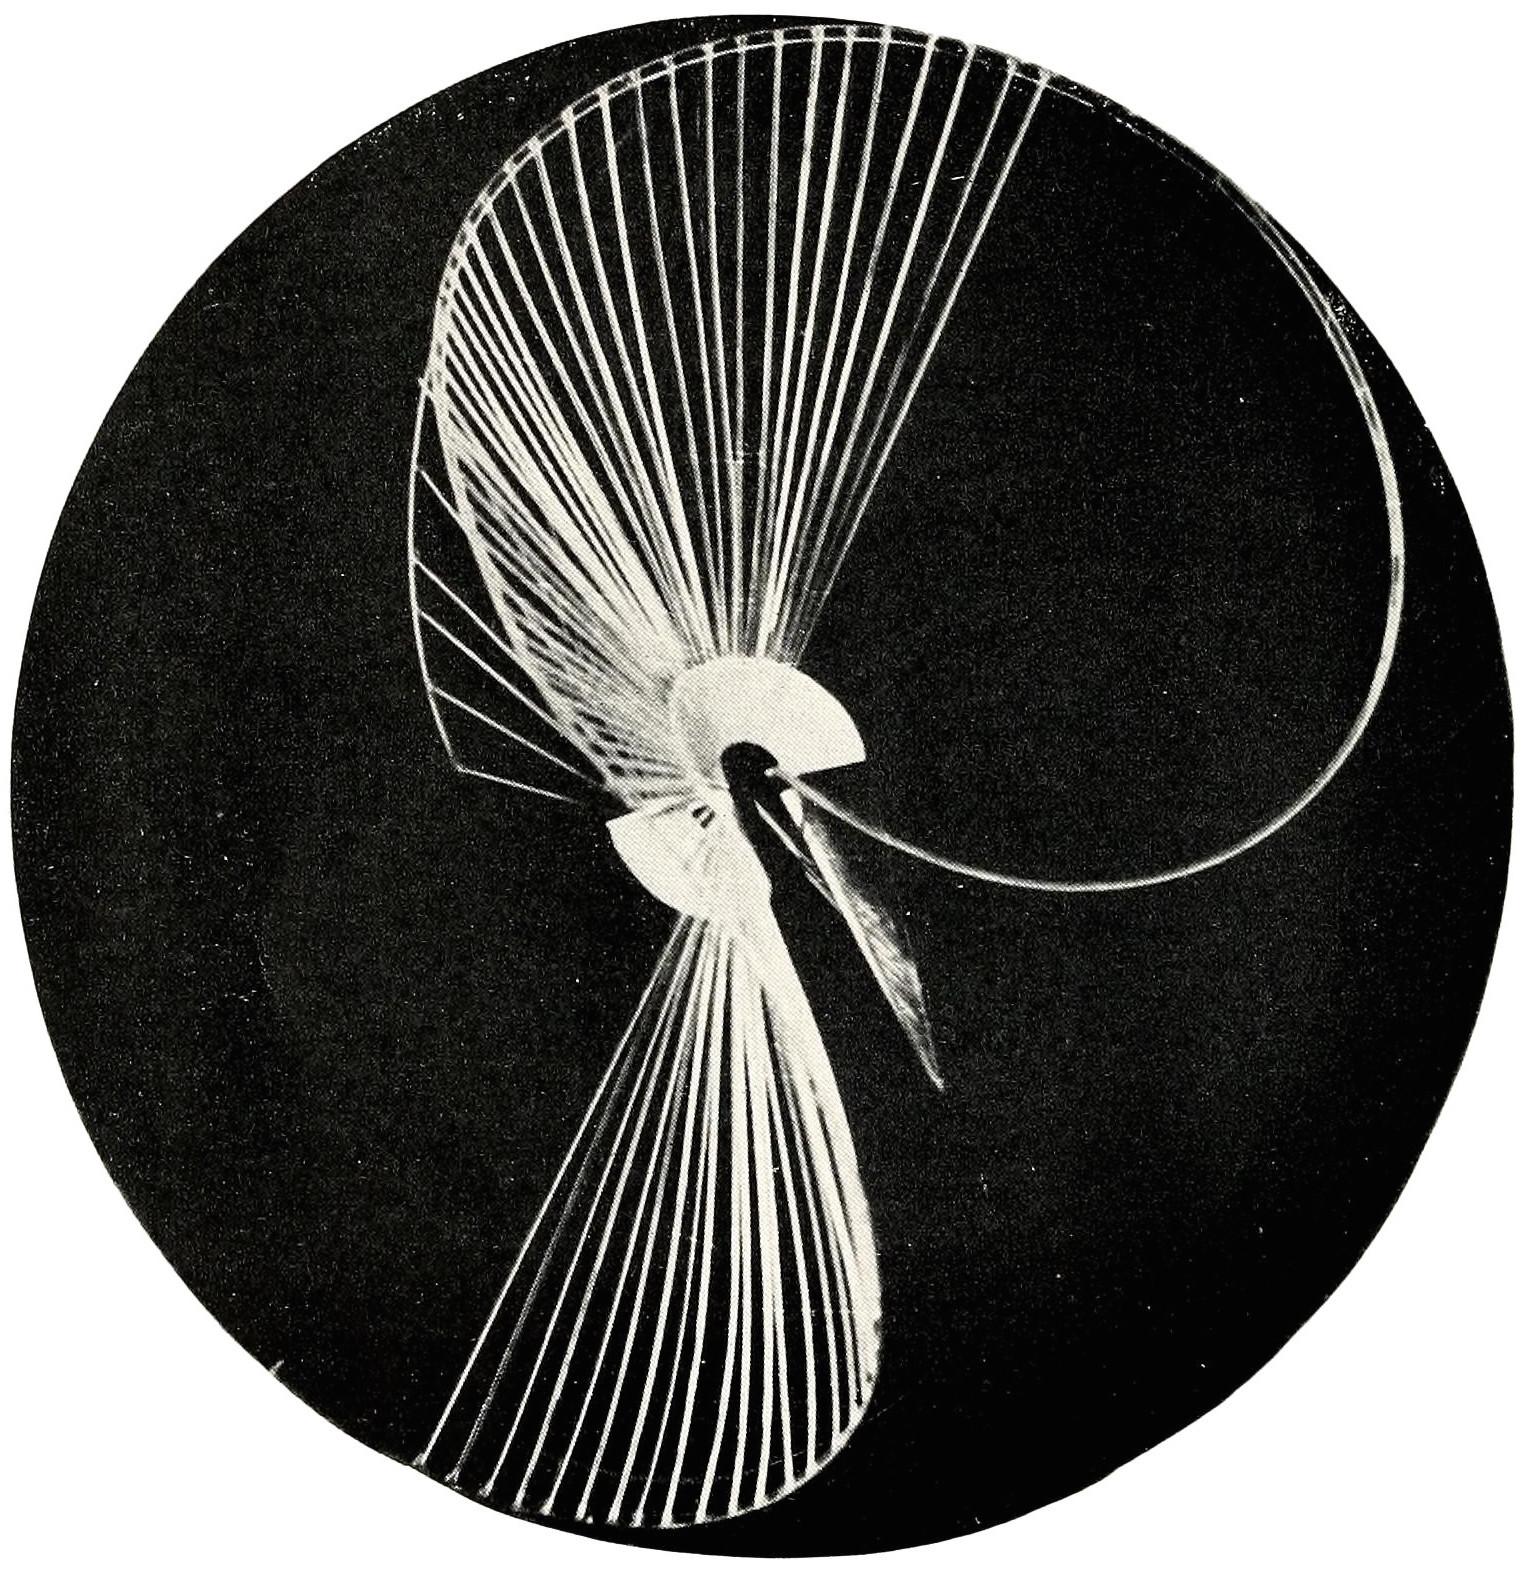 "Naum Gabo, Spheric relief construction (1937), plastic 18"" high"